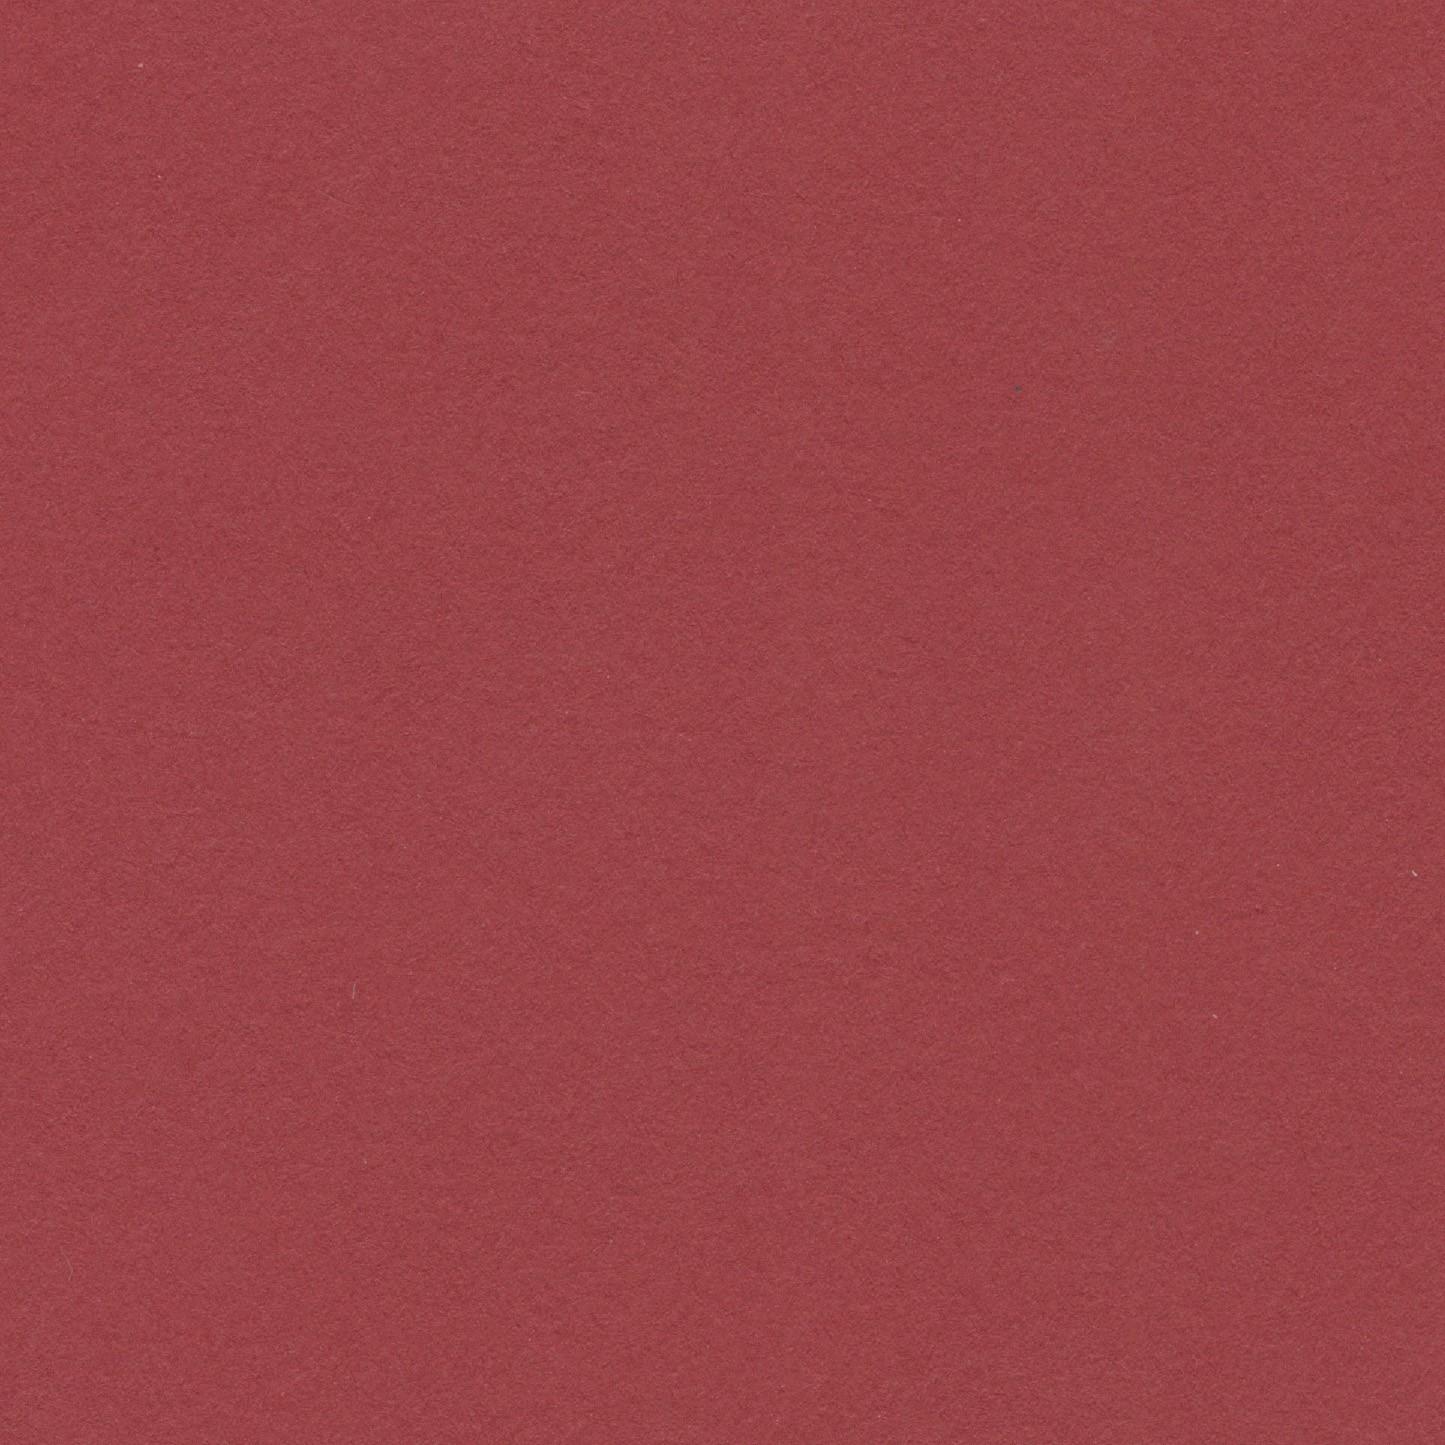 Red - Cinnabar 135gsm